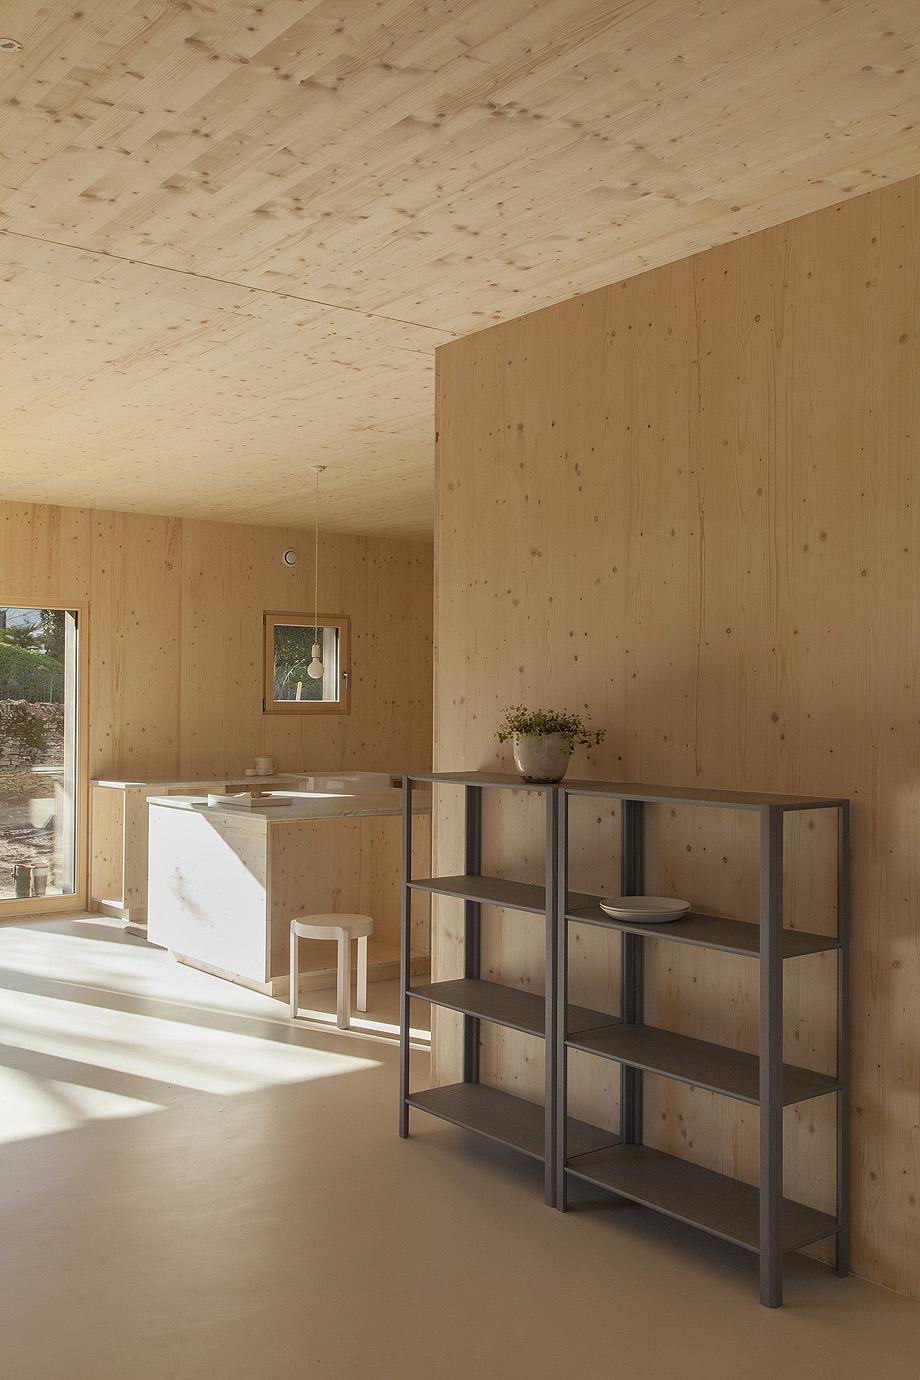 casa pasiva de atelier ordinaire - foto julien renault (22)